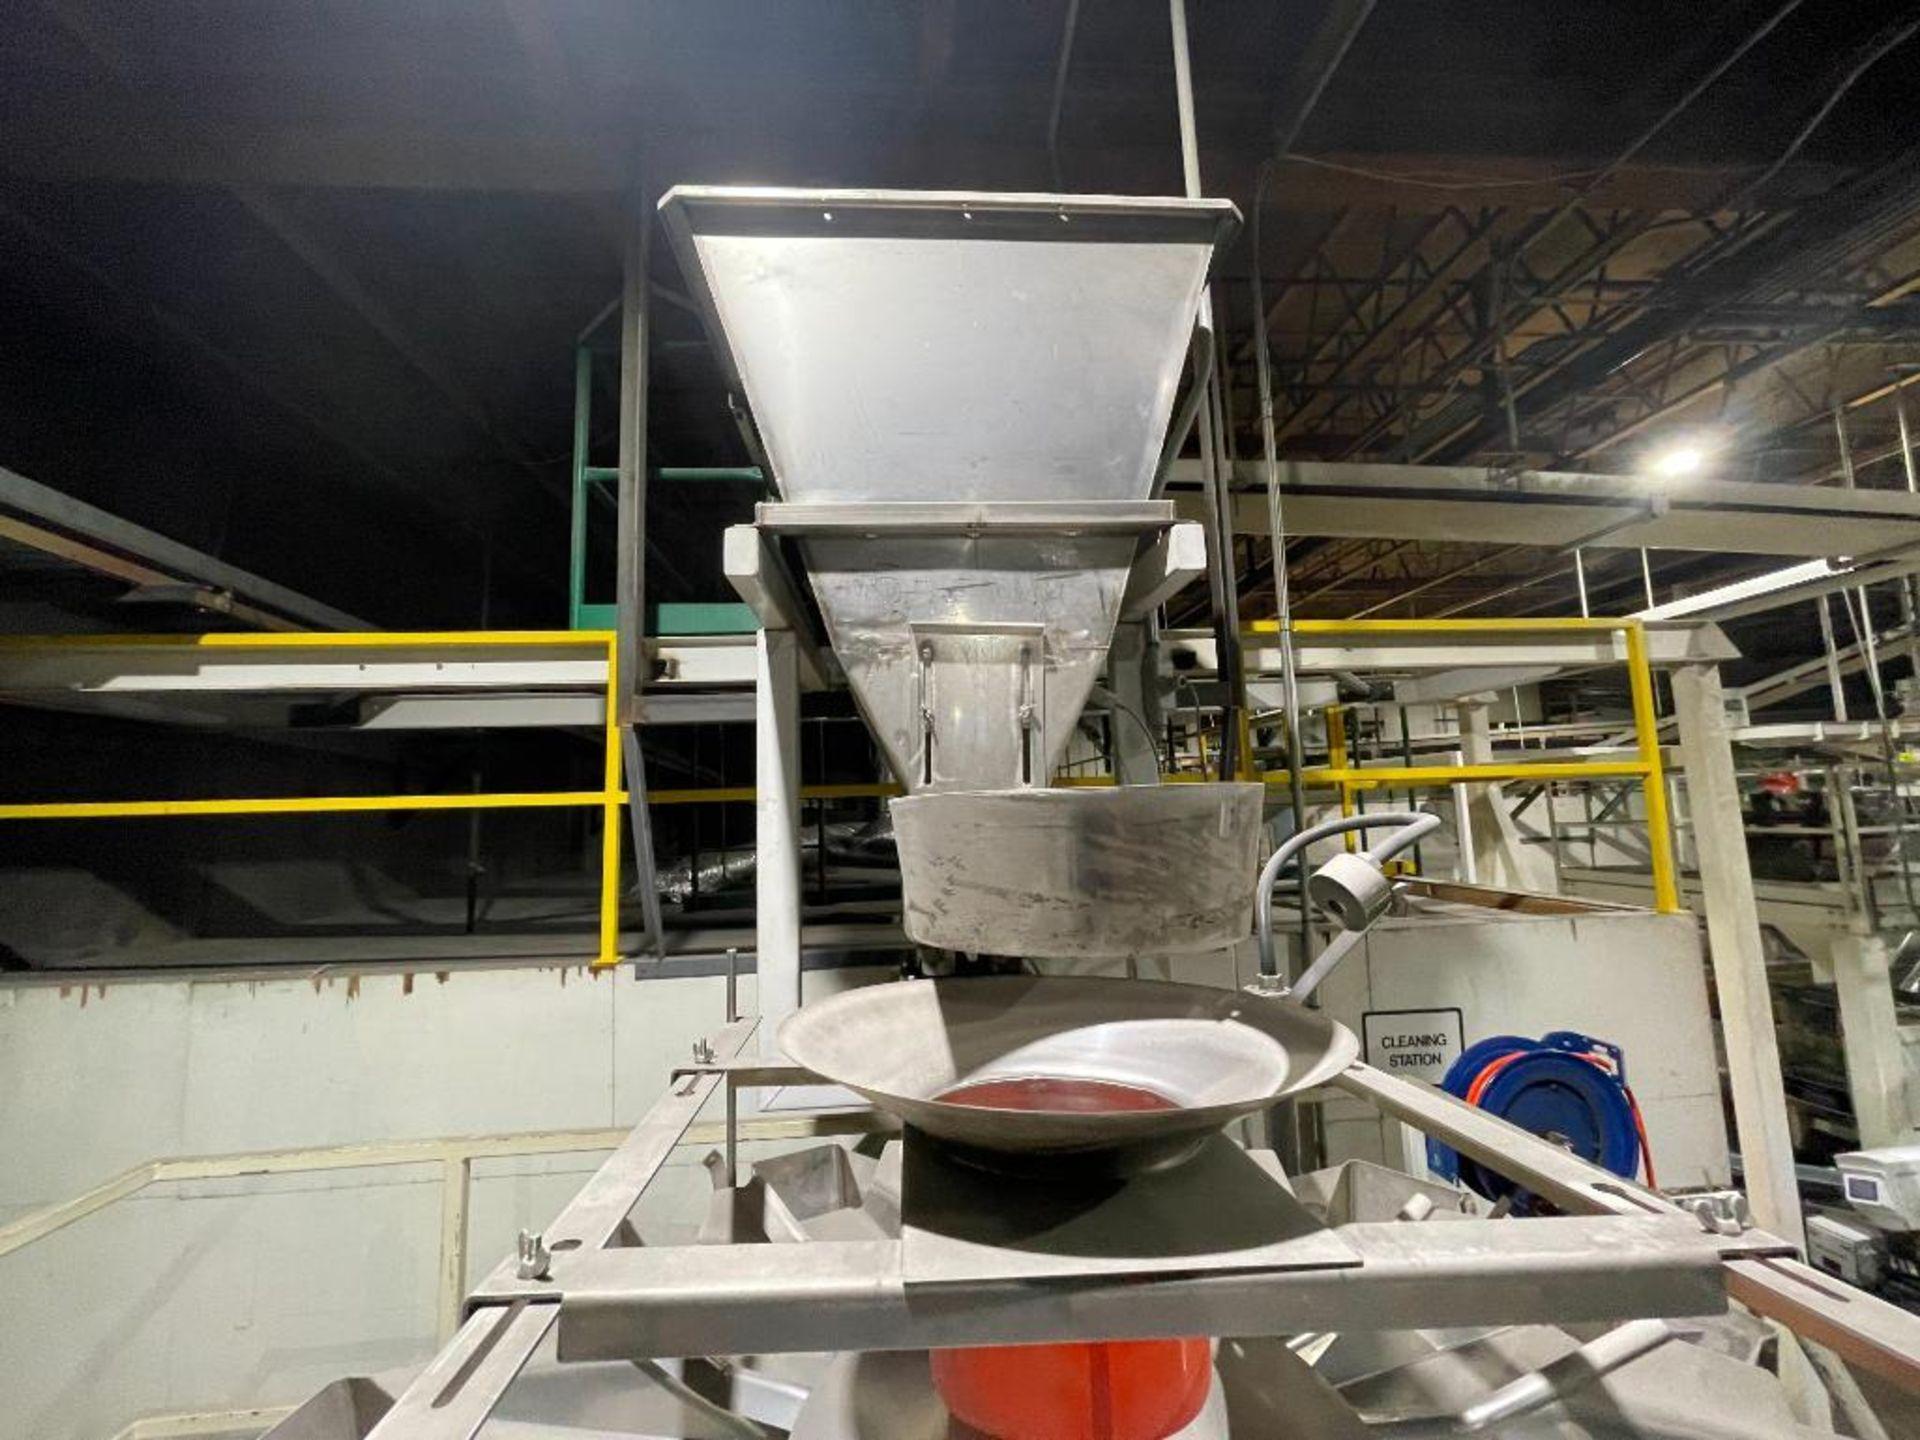 Eriez vibratory conveyor - Image 7 of 12